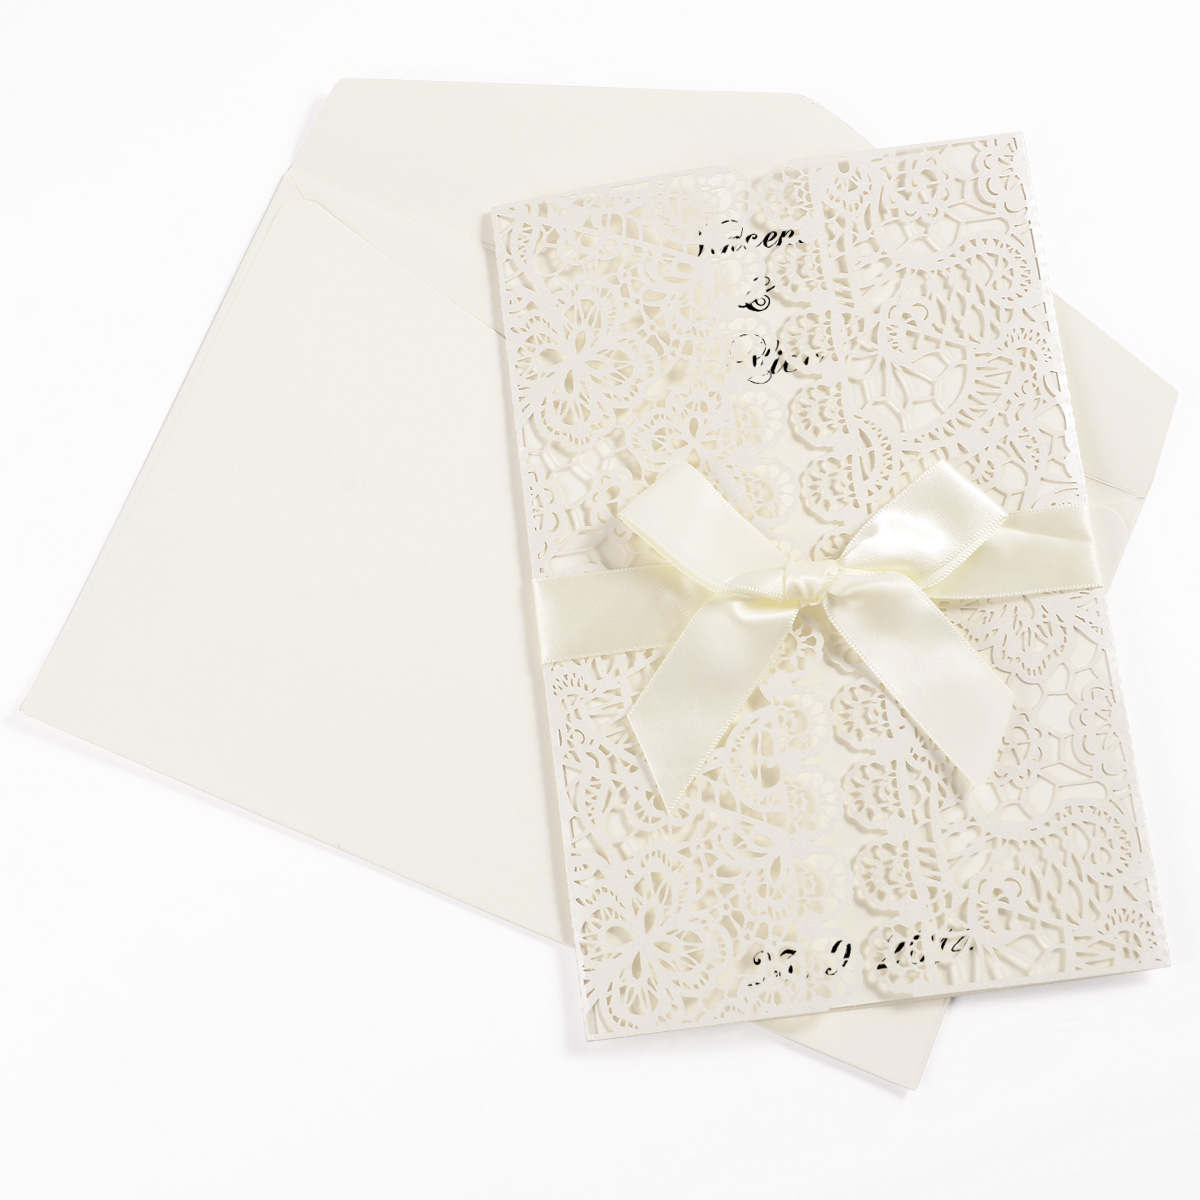 10er einladungskarten elegante blume spitze design. Black Bedroom Furniture Sets. Home Design Ideas